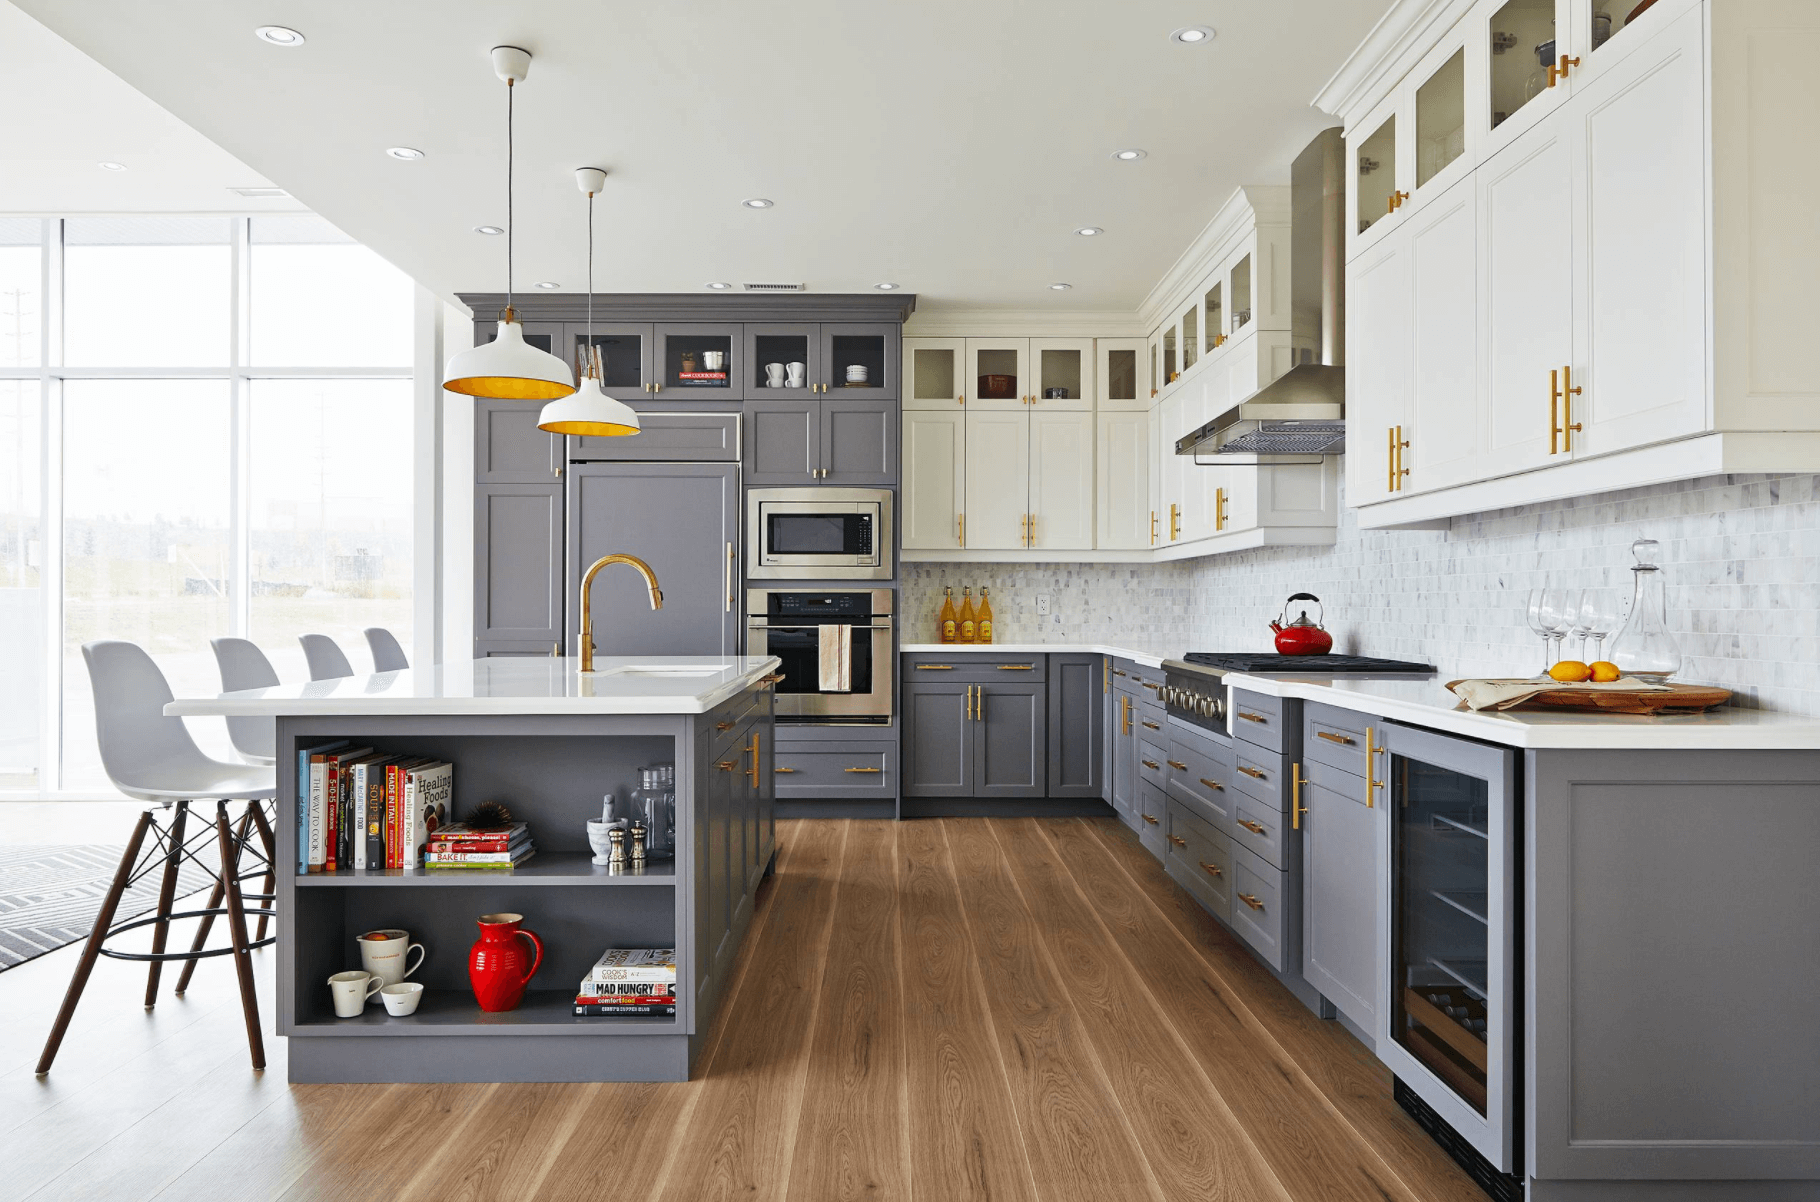 15 home design trends that rocked 2016 httpfreshomecom